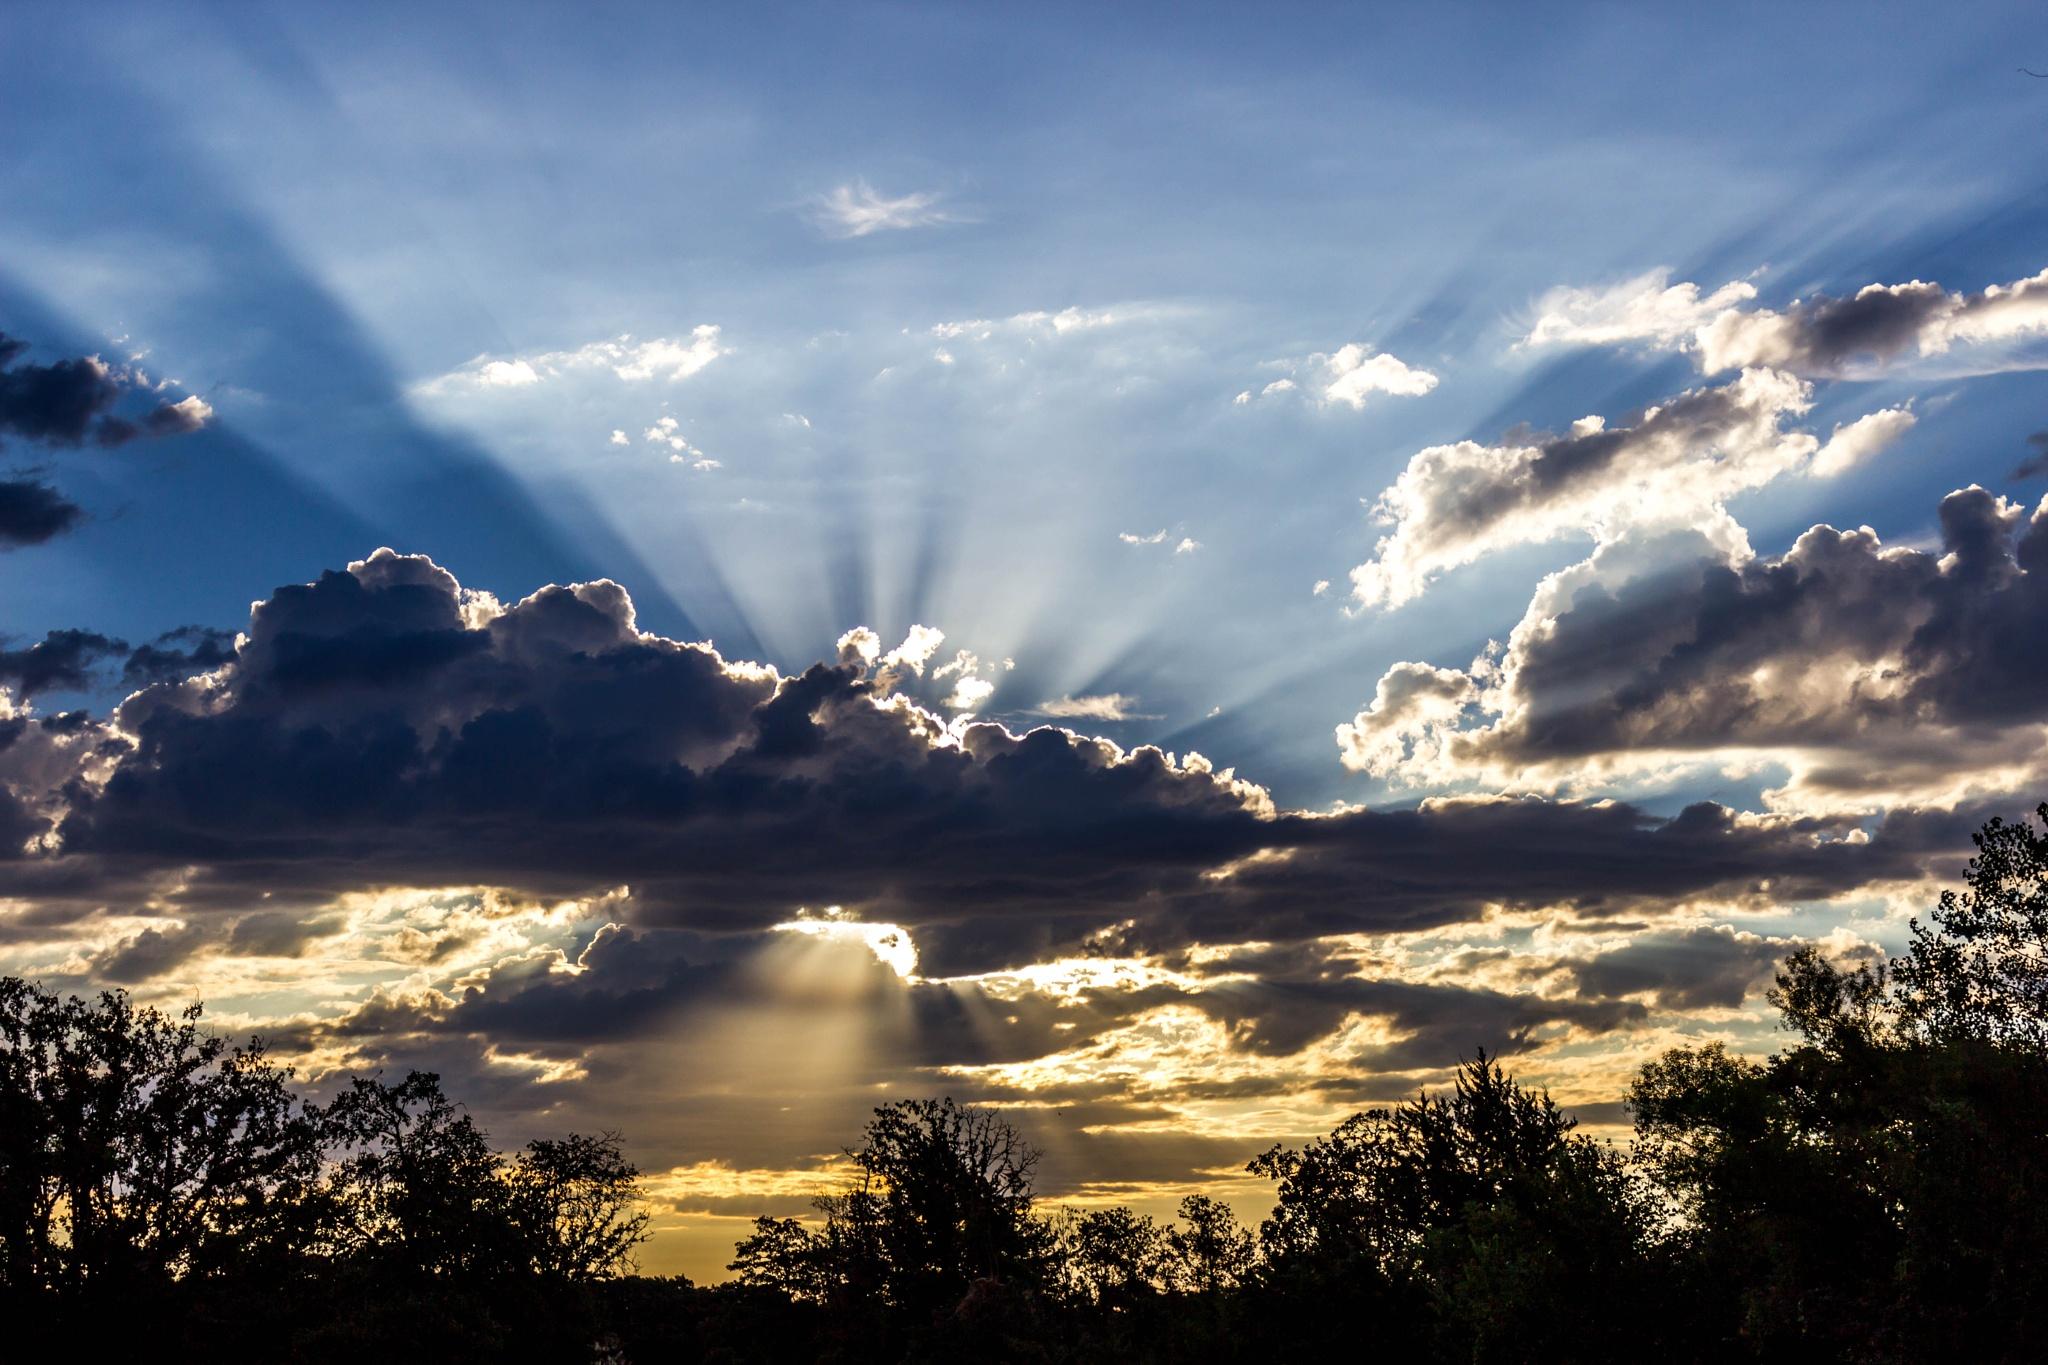 Sunrise Rays by Keith Fife